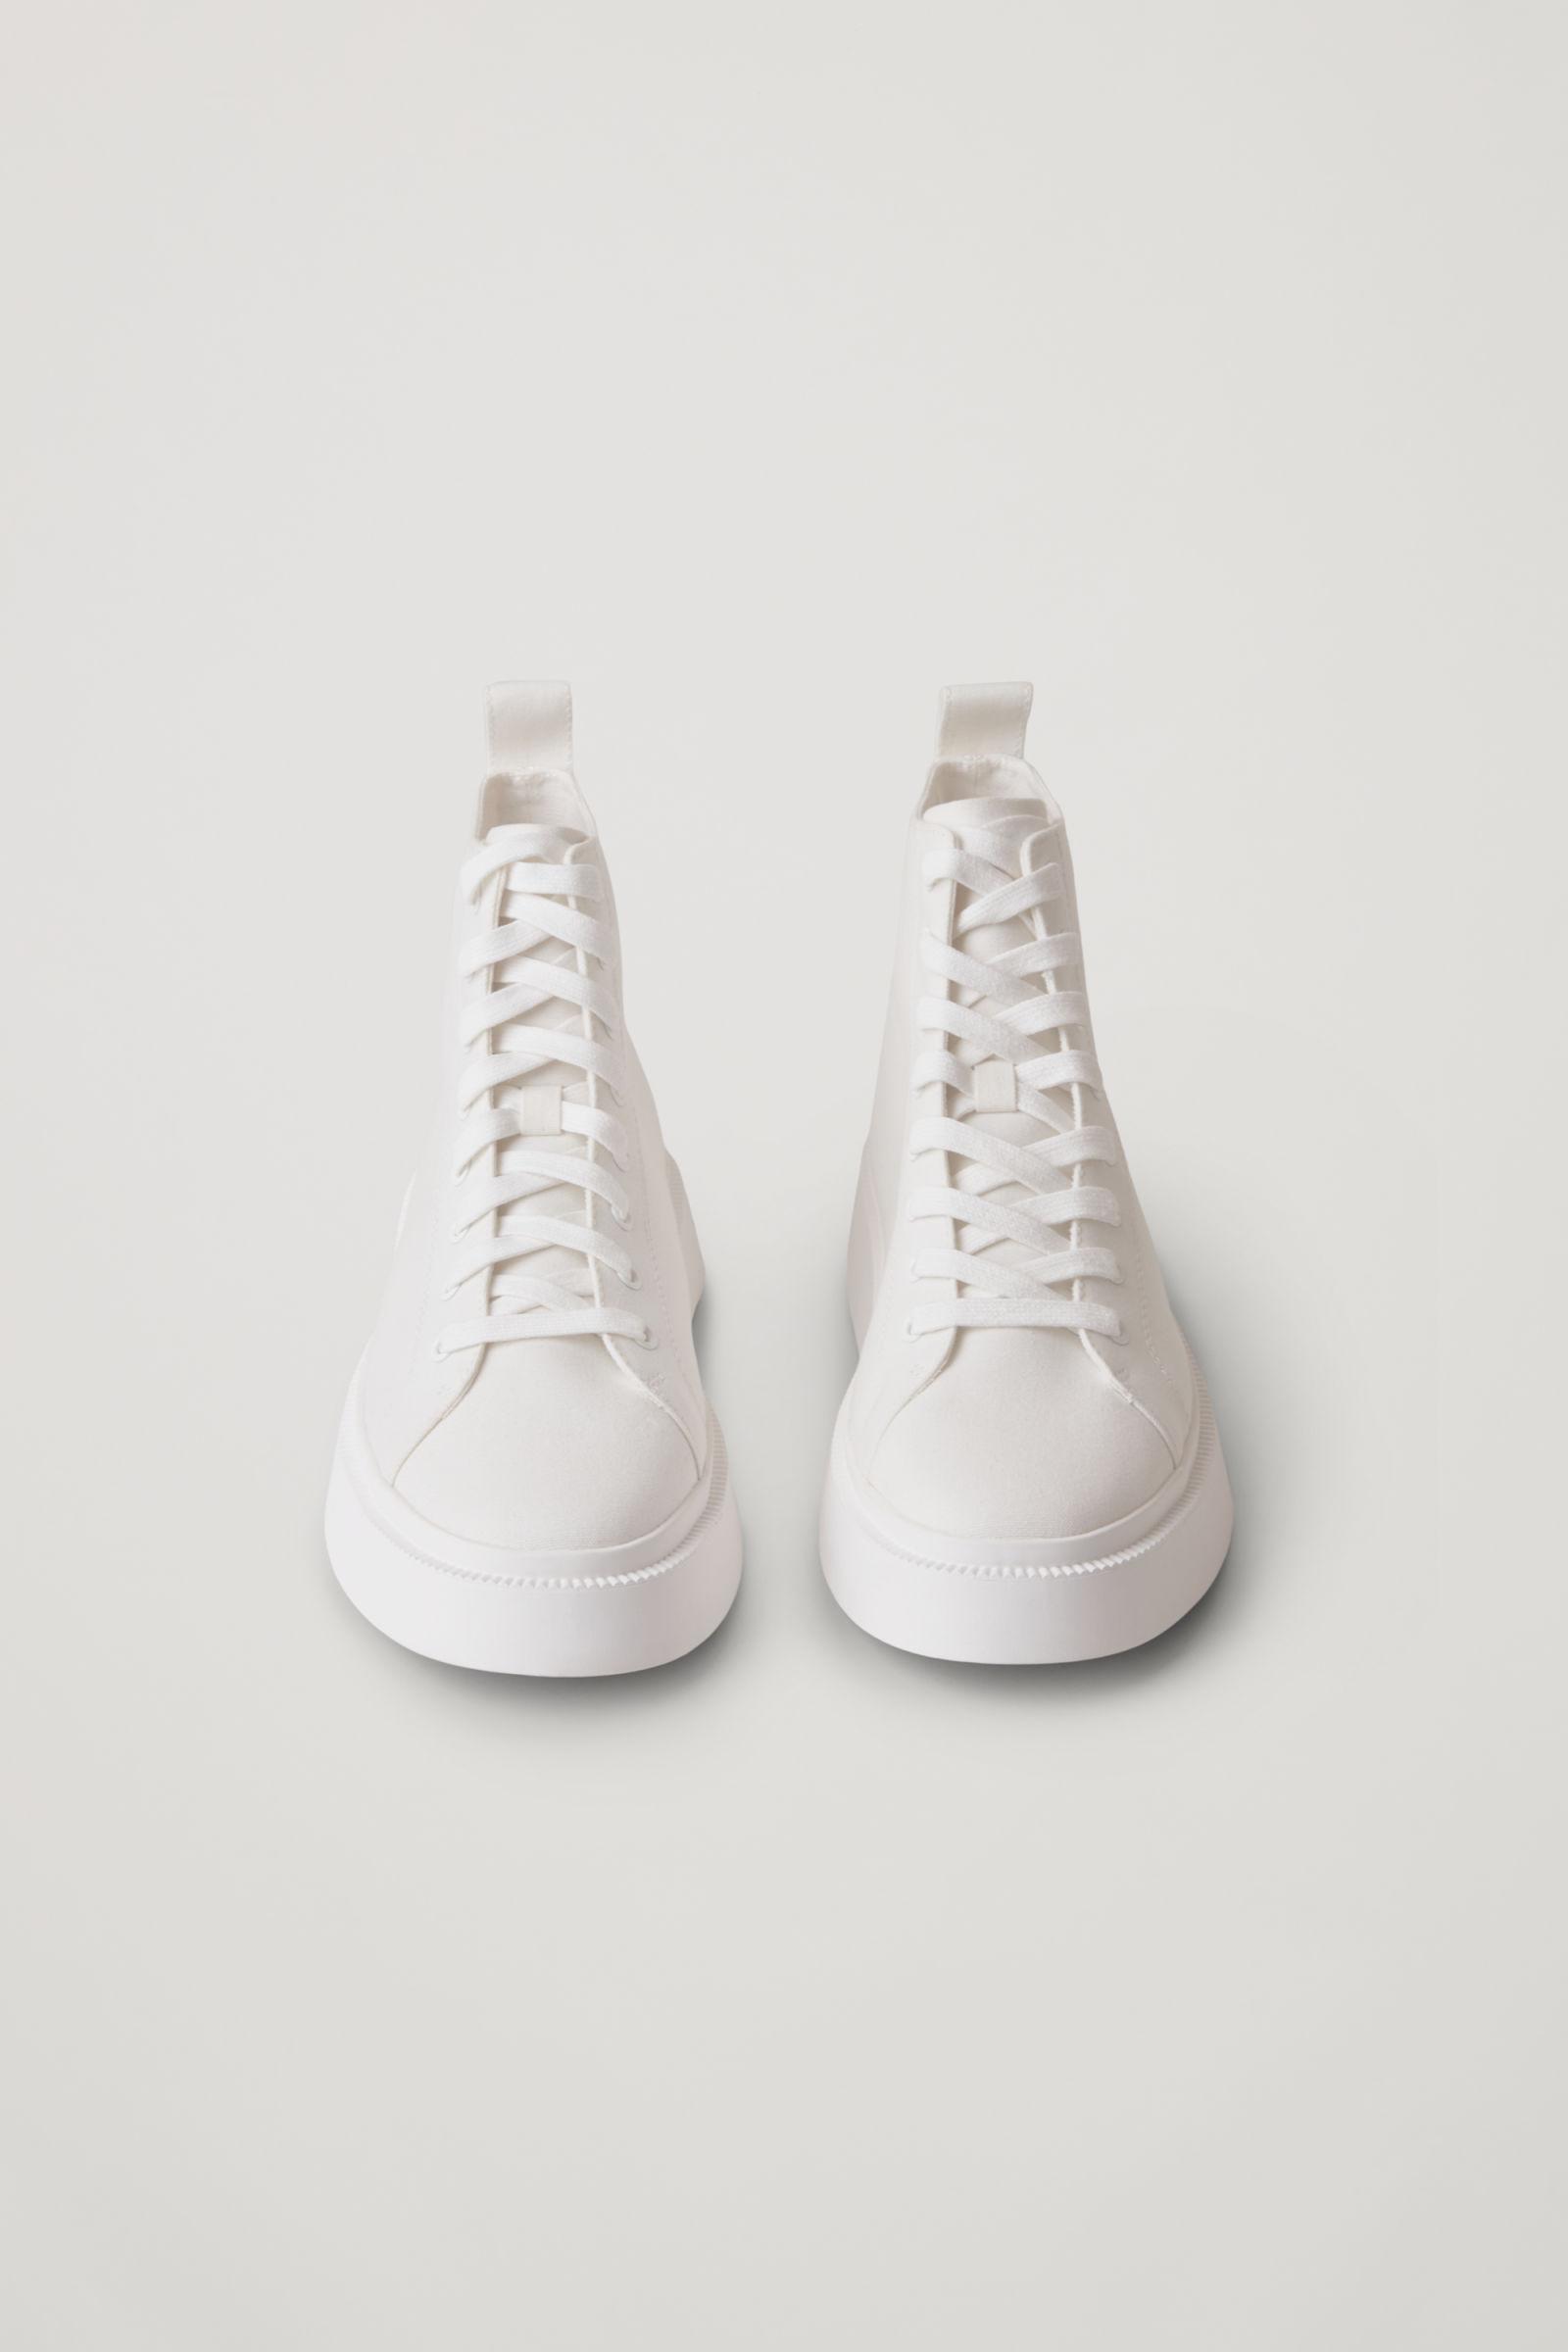 2. kép: COS sneaker